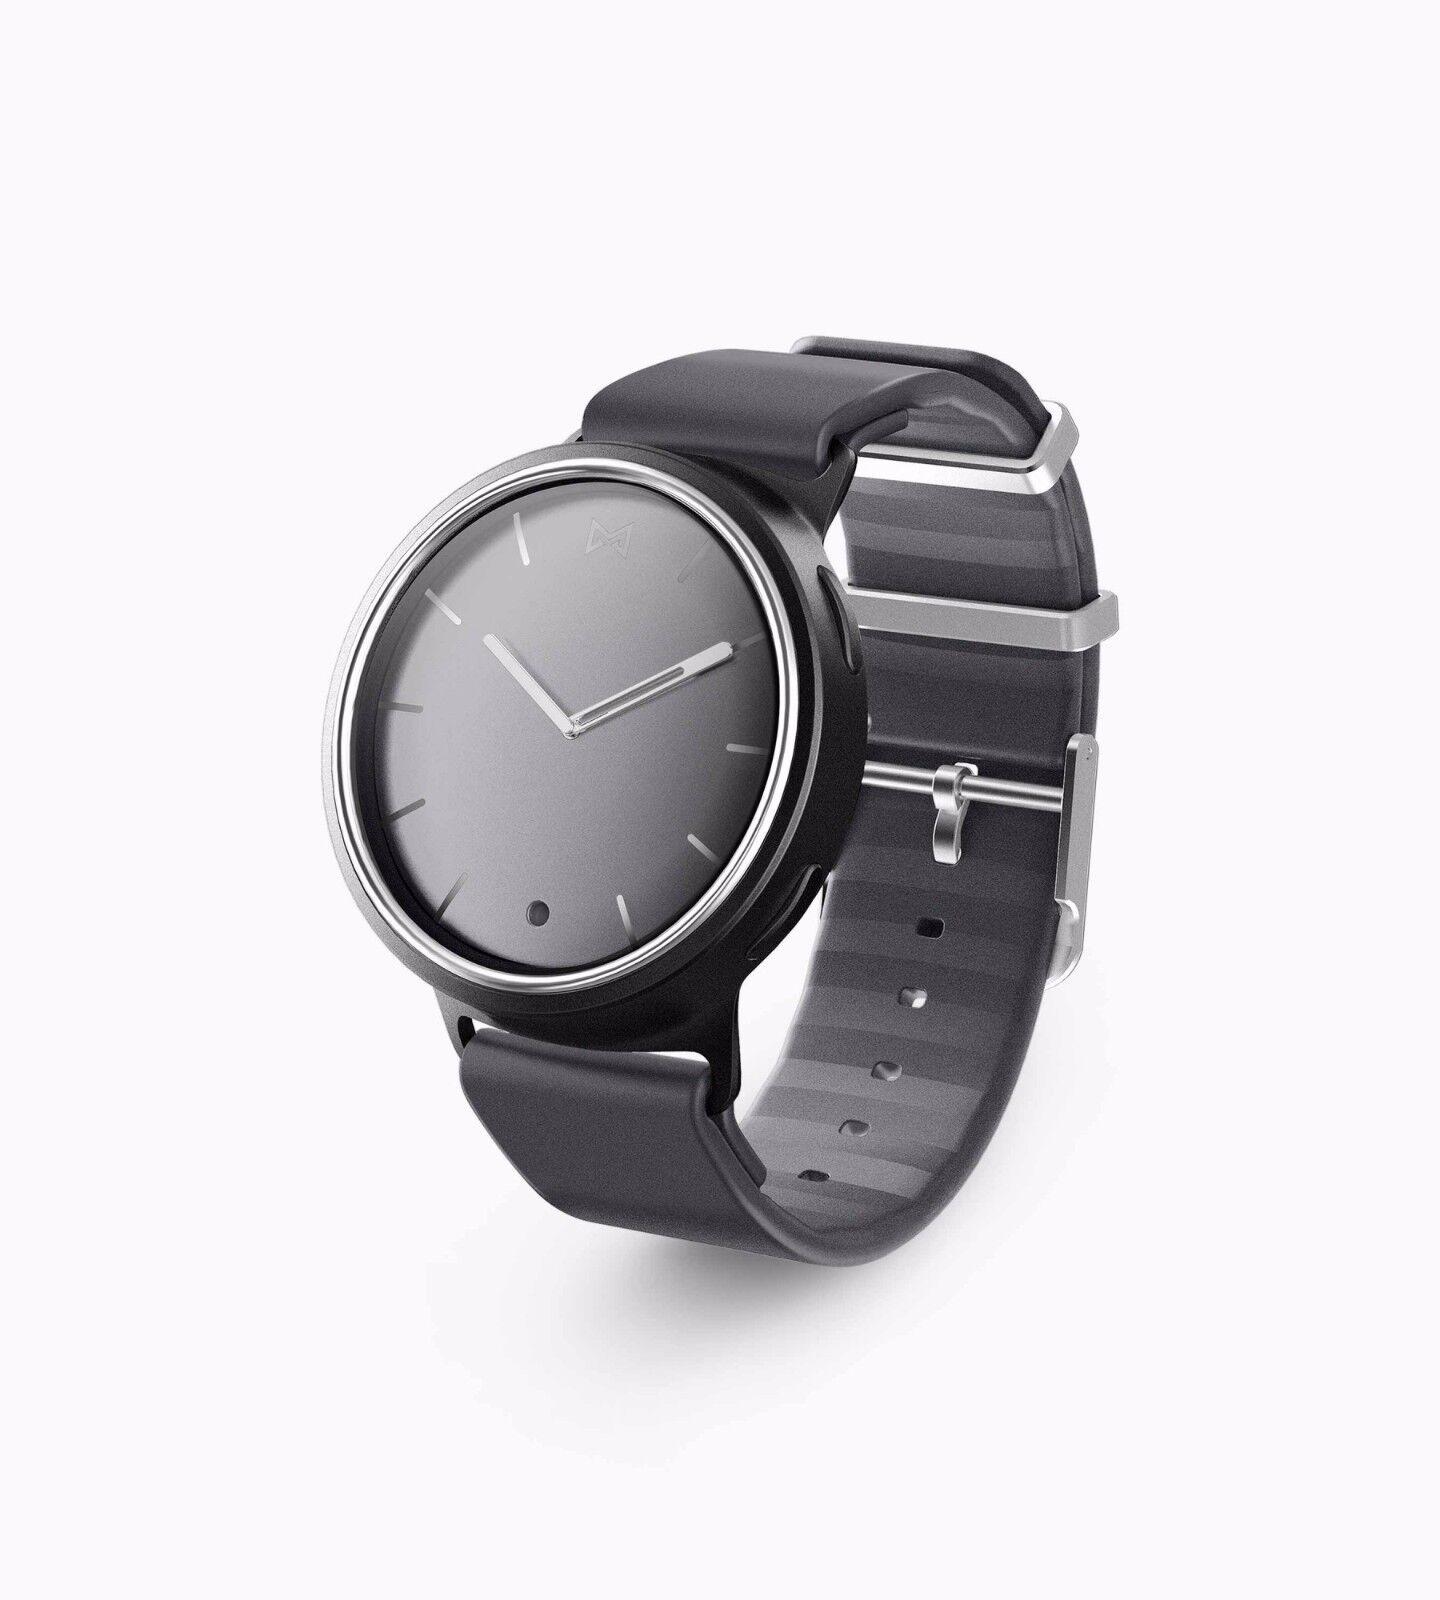 Inadaptado Unisex De Aluminio Caja De Acero Negro Correa de Silicona Reloj MIS5011